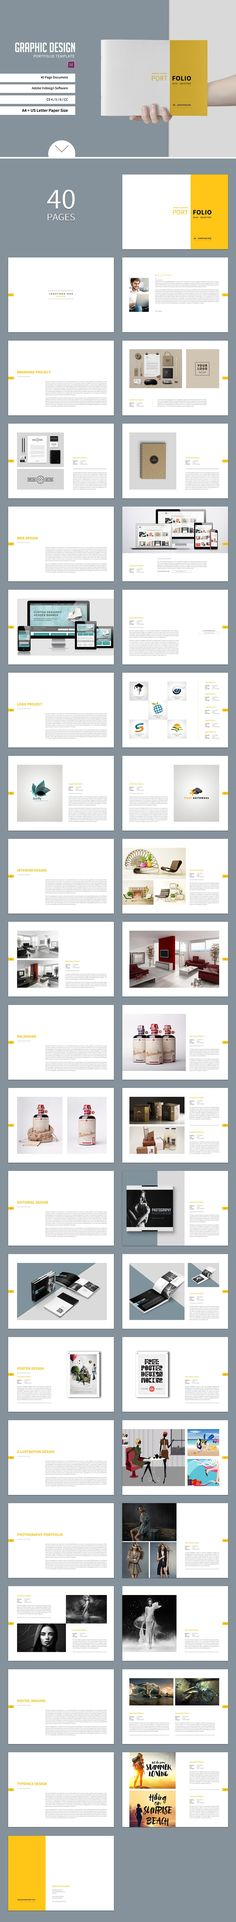 Portfolio Brochure Template Design Reference Pinterest - company portfolio template